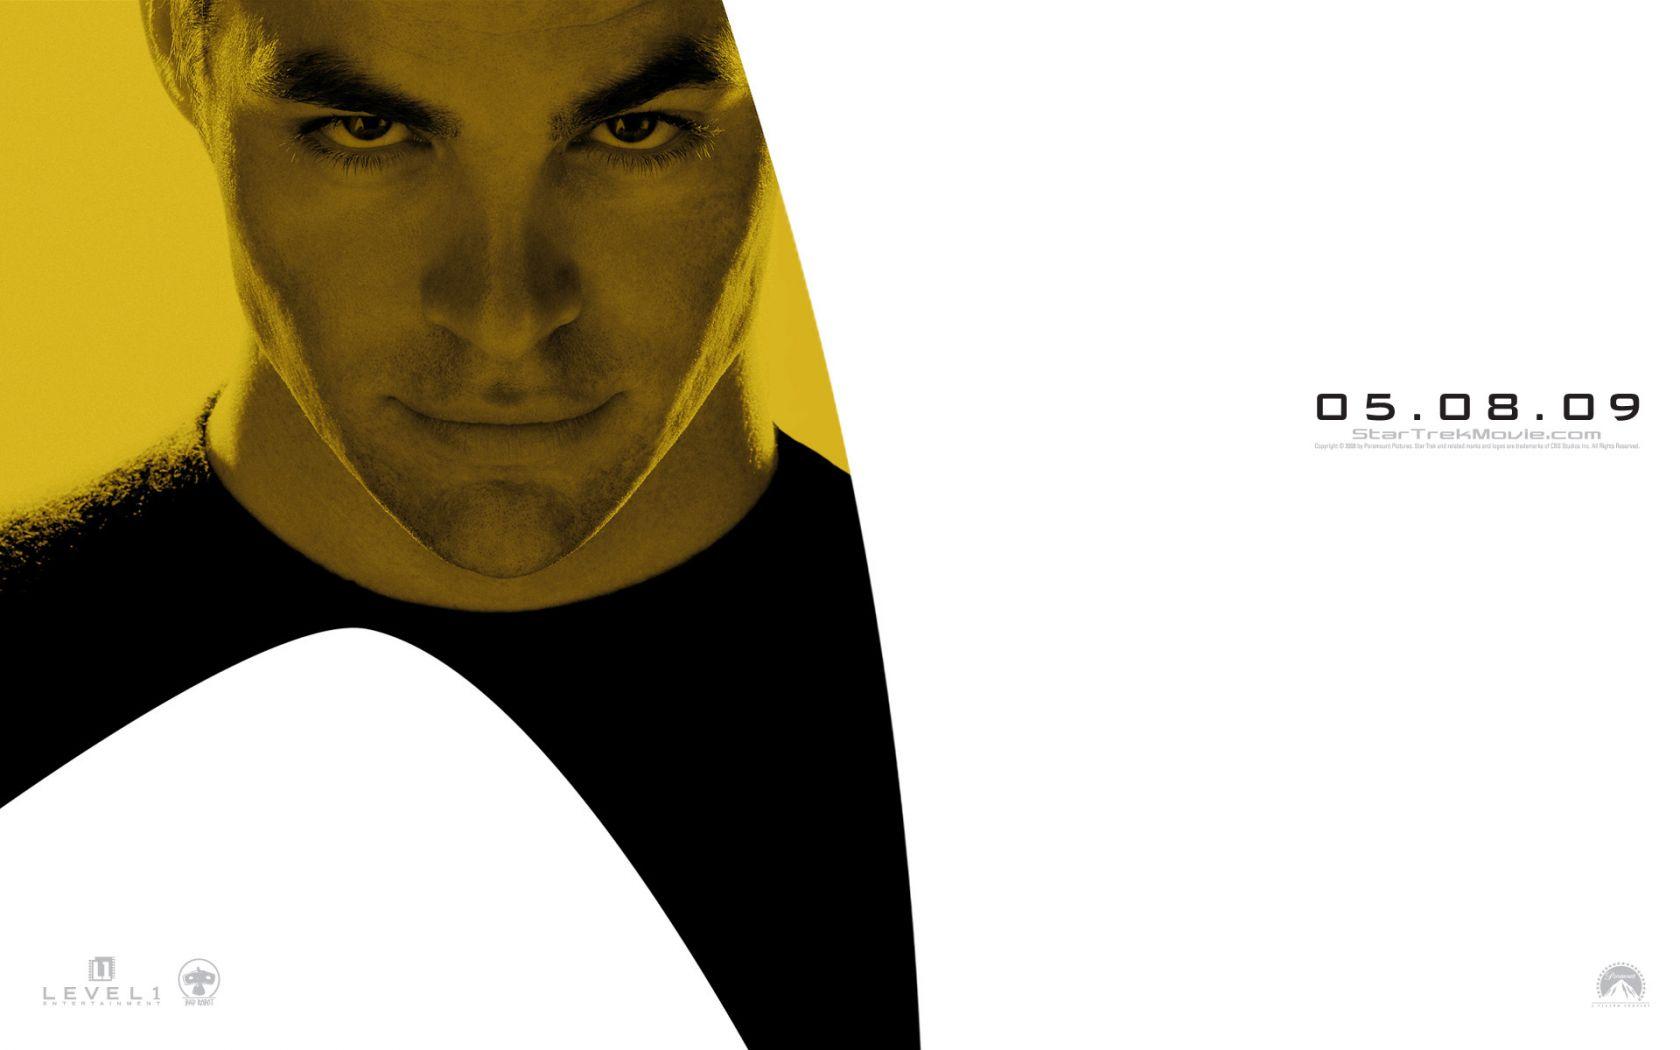 James Kirk Star Trek 2009 Wallpaper 1680x1050